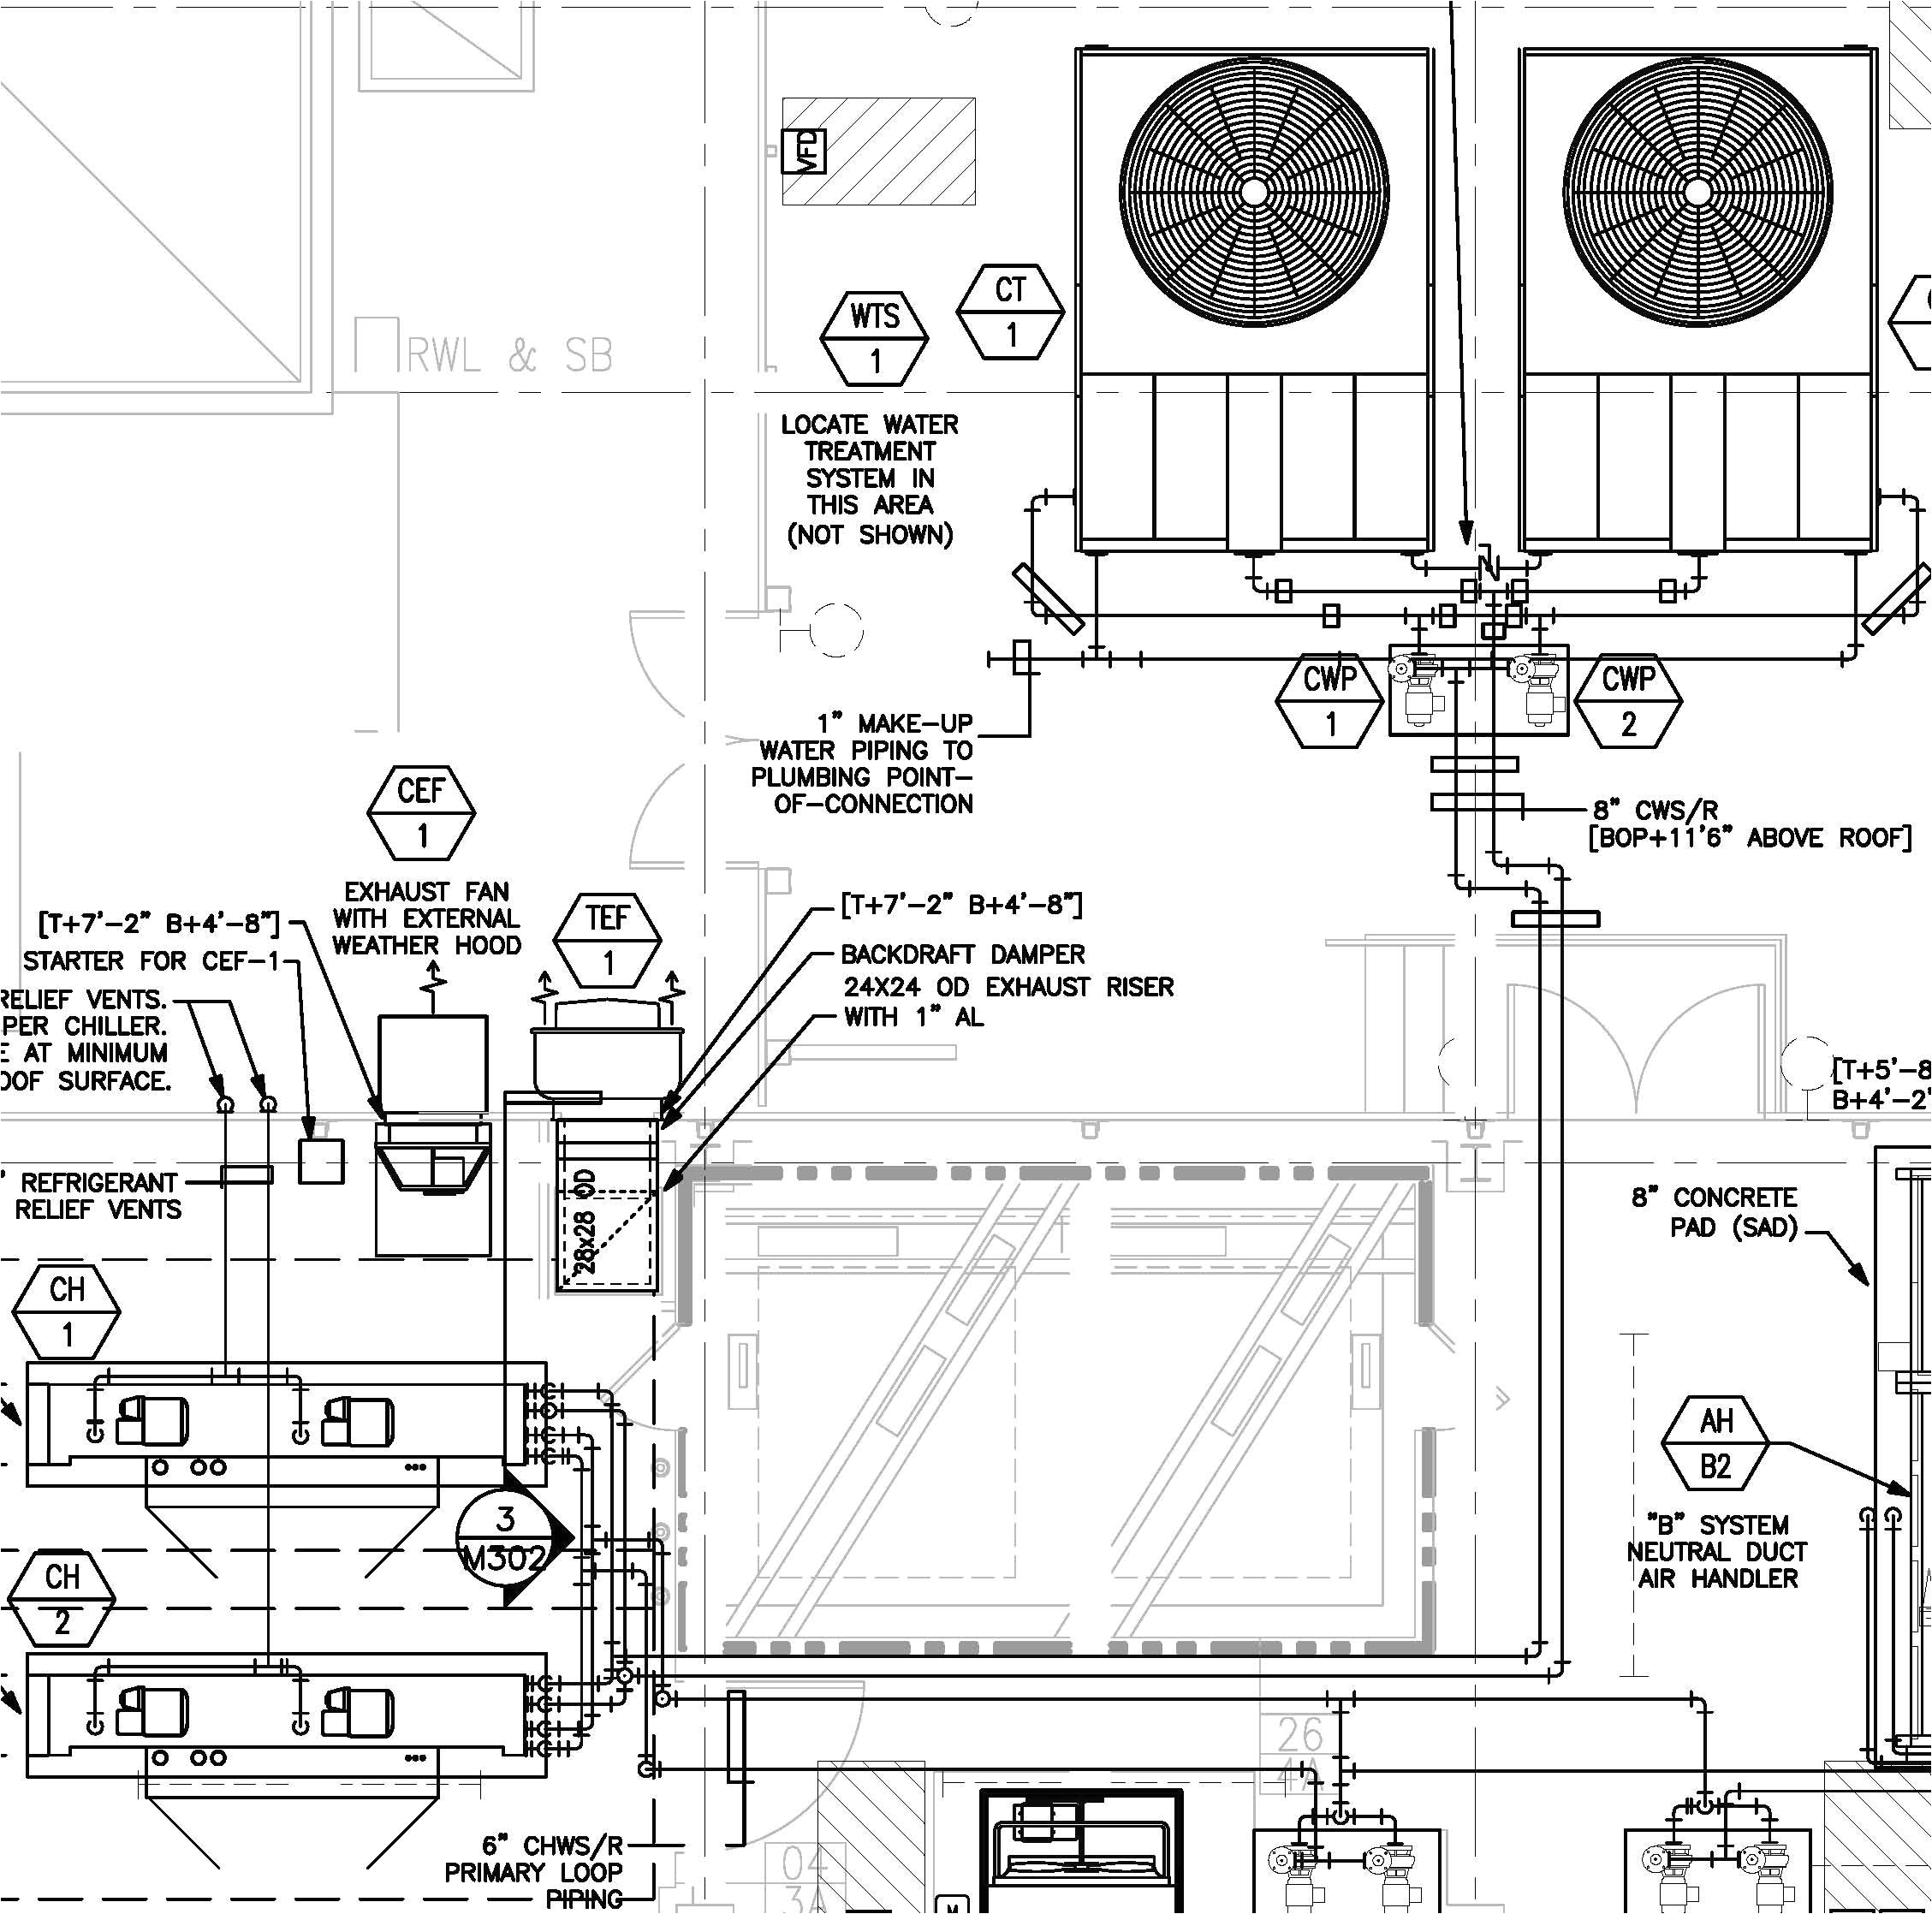 1992 ford ranger fuse diagram wwwjustanswercom ford 48psn fuse diagram http wwwjustanswercom hyundai 46osghyundaiaccent